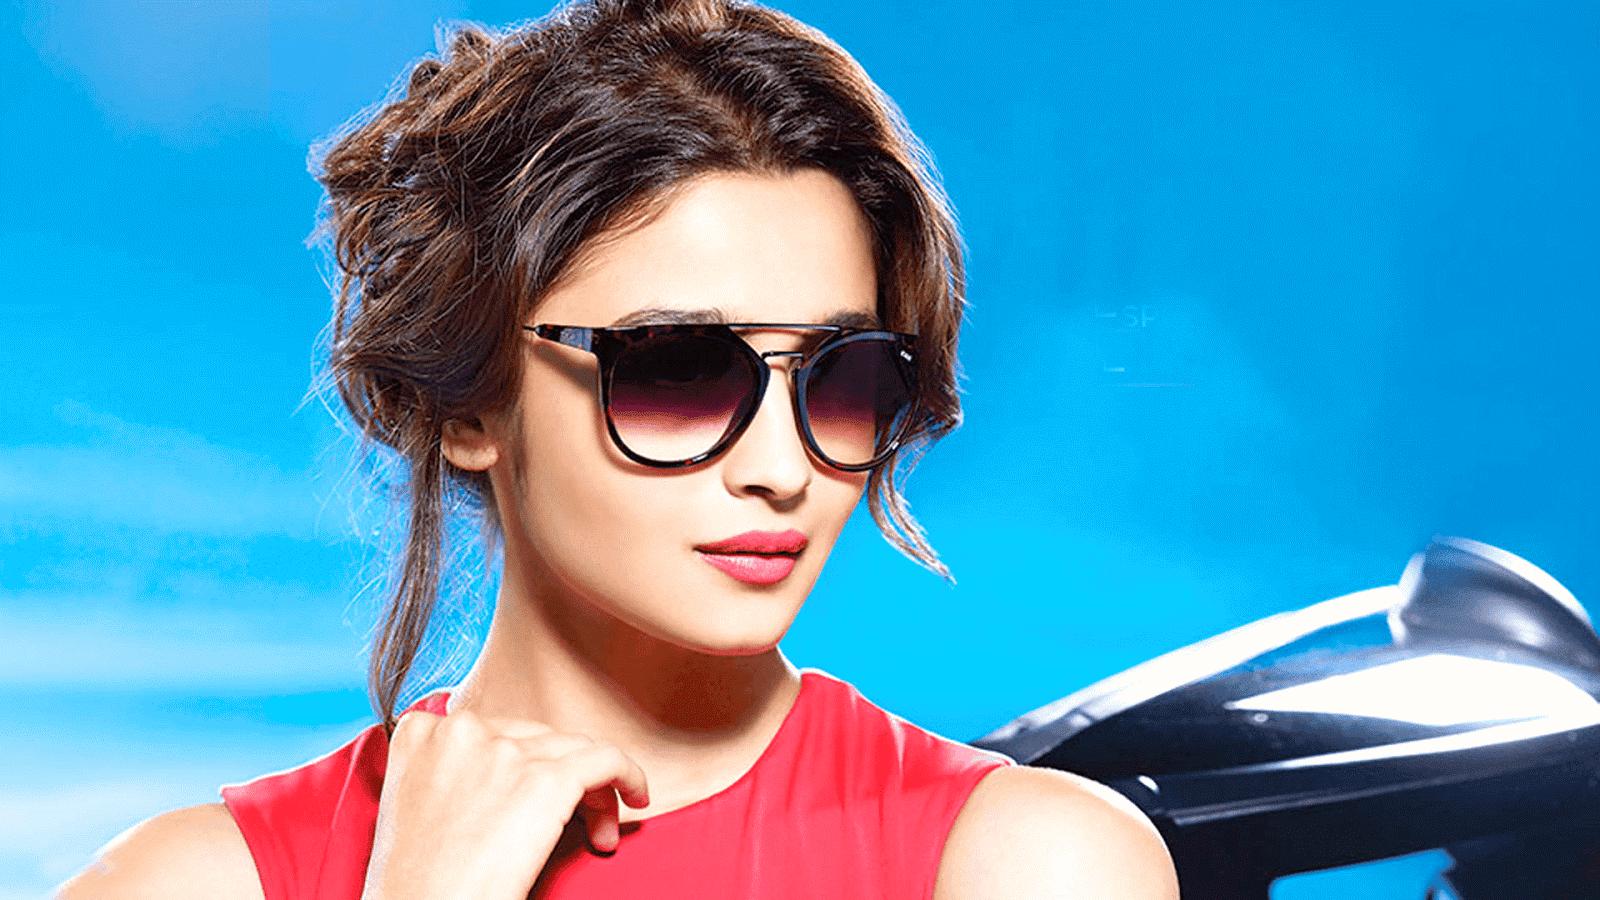 Alia Bhatt Wallpapers Hd Download Free 1080P -7344